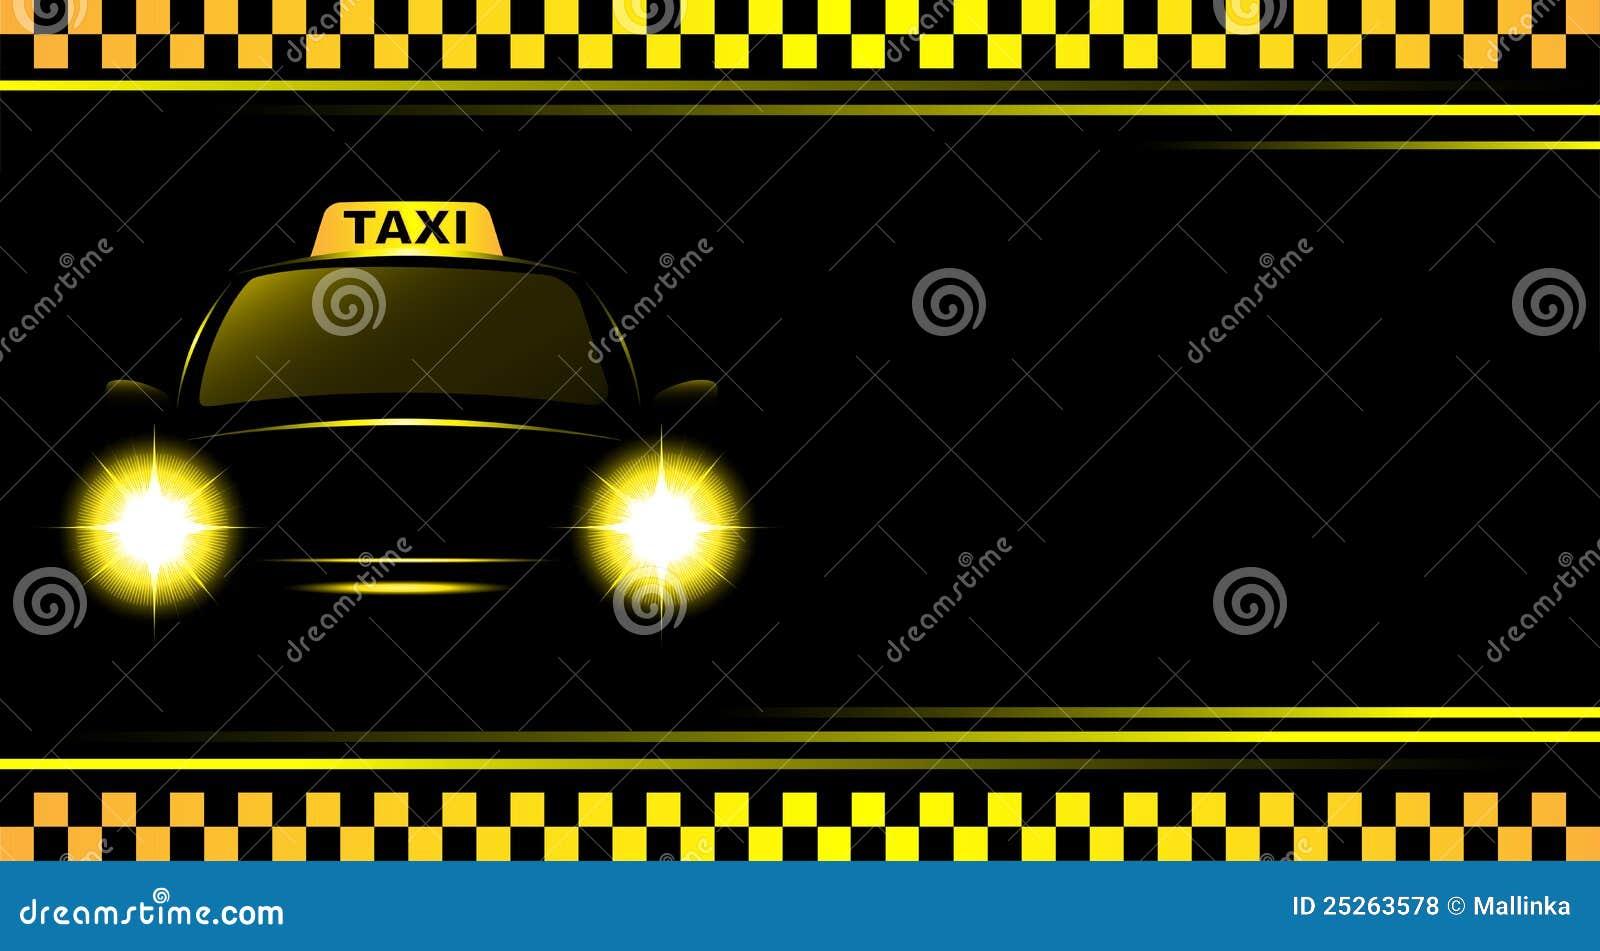 Bakgrundscabtecknet taxar